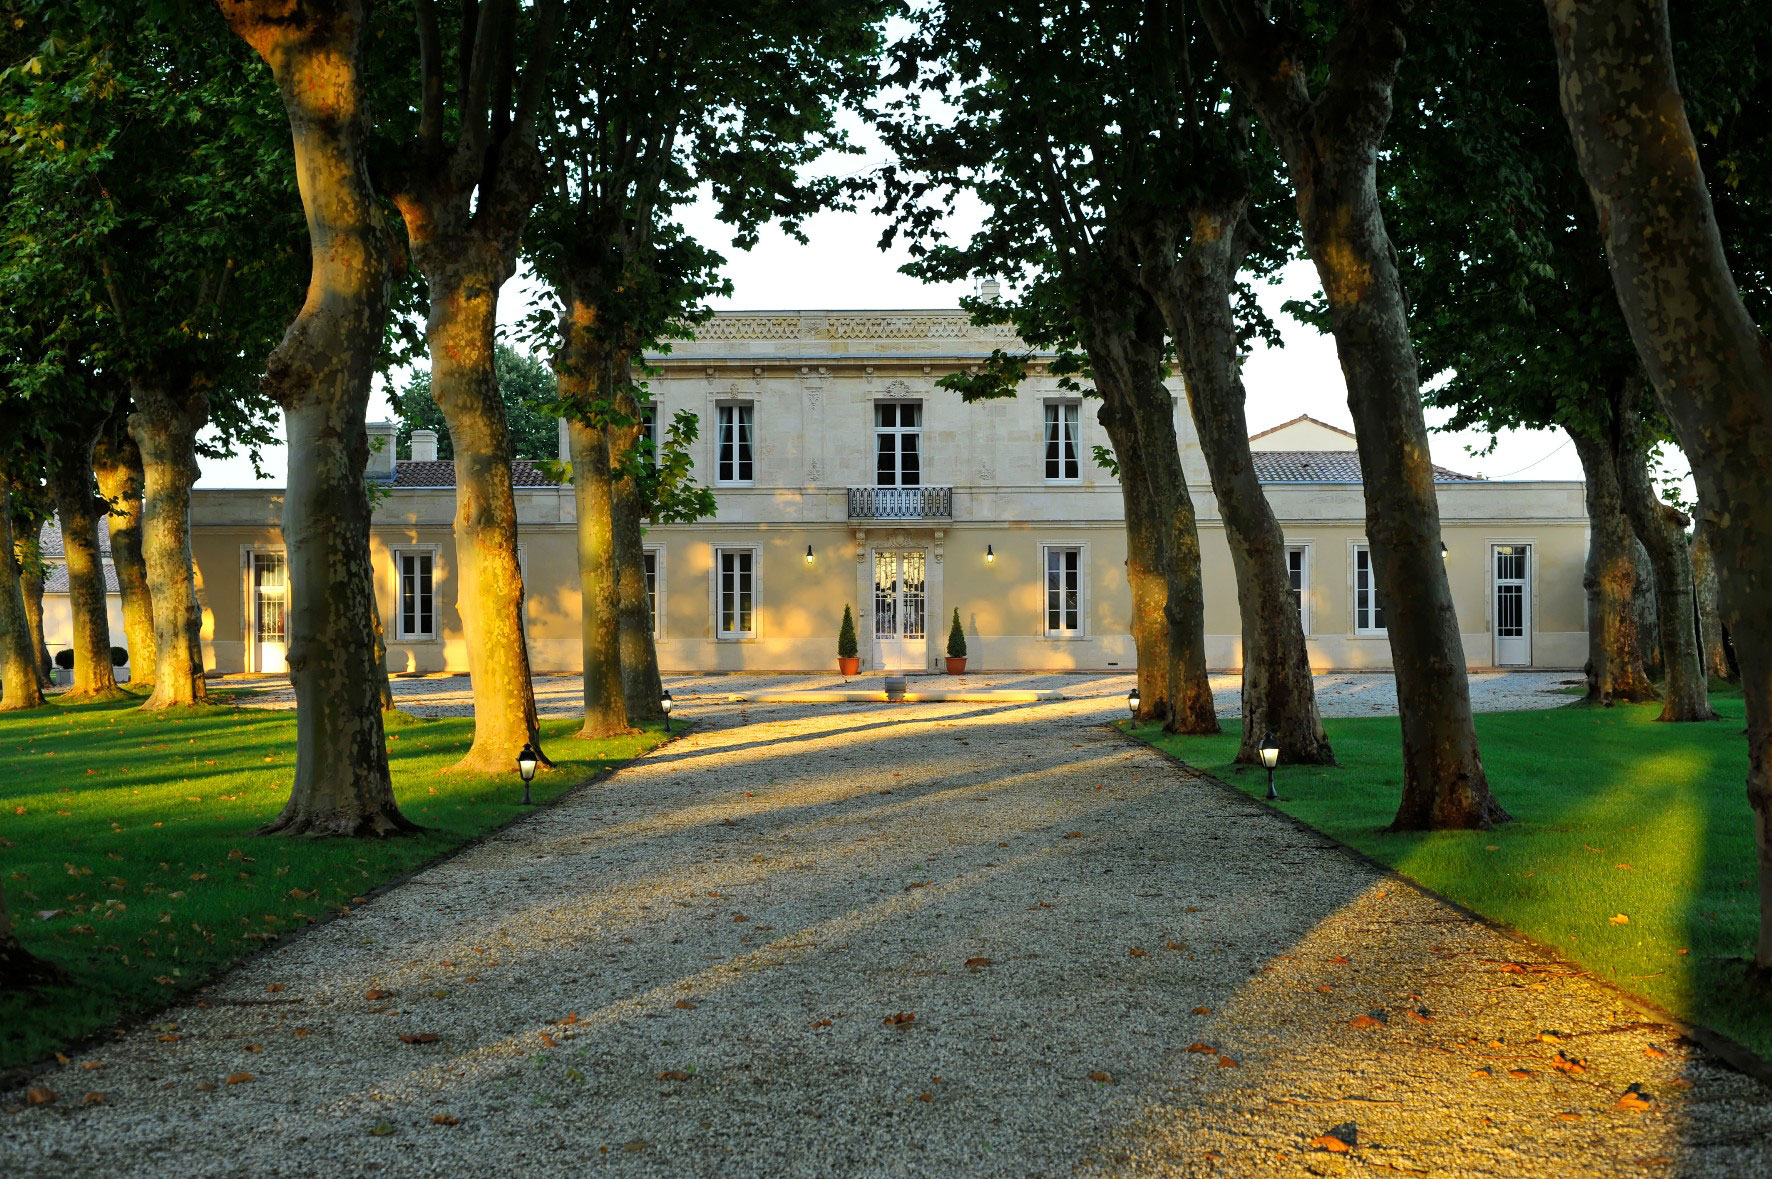 Chateau Haut-Breton Larigaudiere